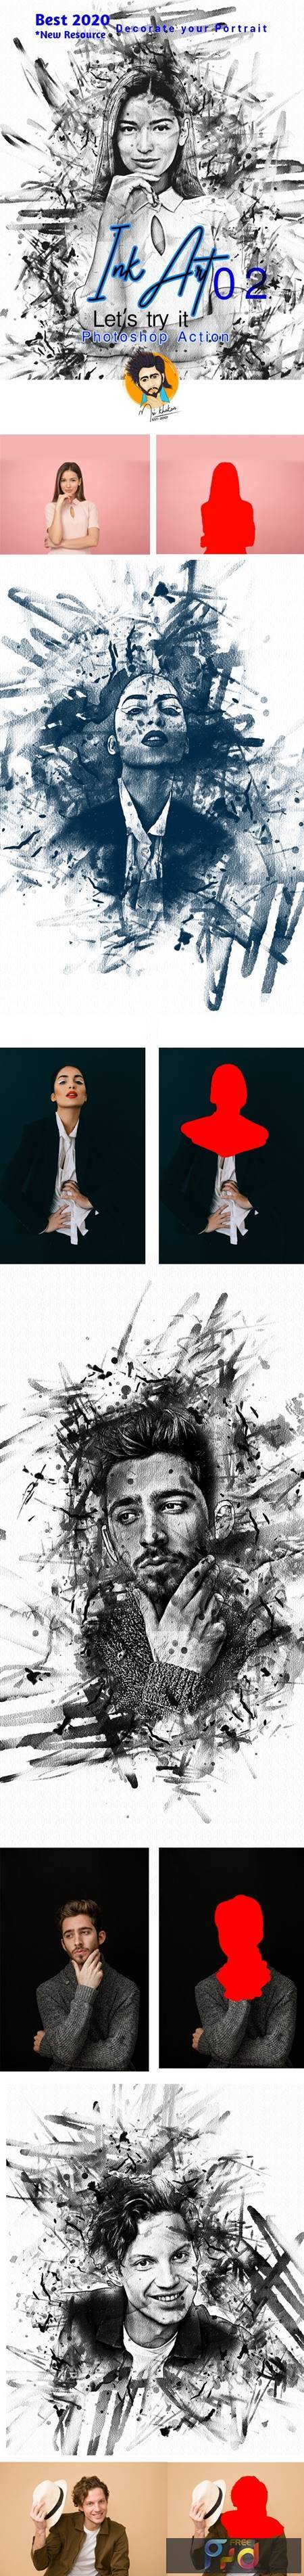 Ink Art Photoshop Action 28928160 1